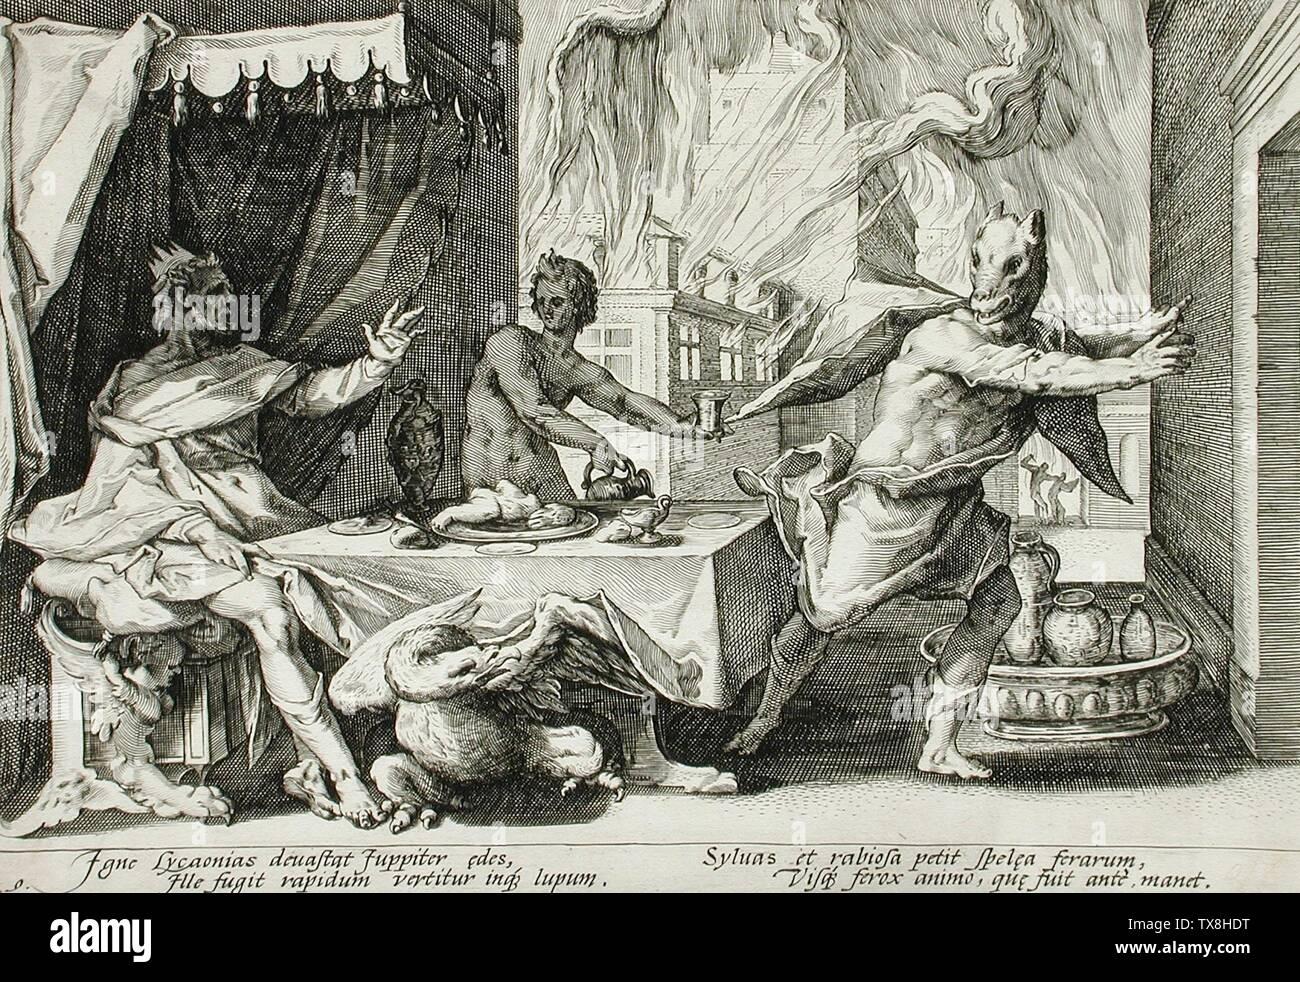 'Lycaon Transformed into a Wolf; English:  Holland, published 1589 Book: Metamorphoses by Ovid, book 1, plate 9 Prints; engravings Engraving Graphic Arts Council Curatorial Discretionary Fund (M.71.76.9) Prints and Drawings Français: Lycaon. Gravure d'Hendrik Goltzius (1558-1617) pour les Métamorphoses d'Ovide, livre I, 209 et suiv.; Published 1589; ' - Stock Image